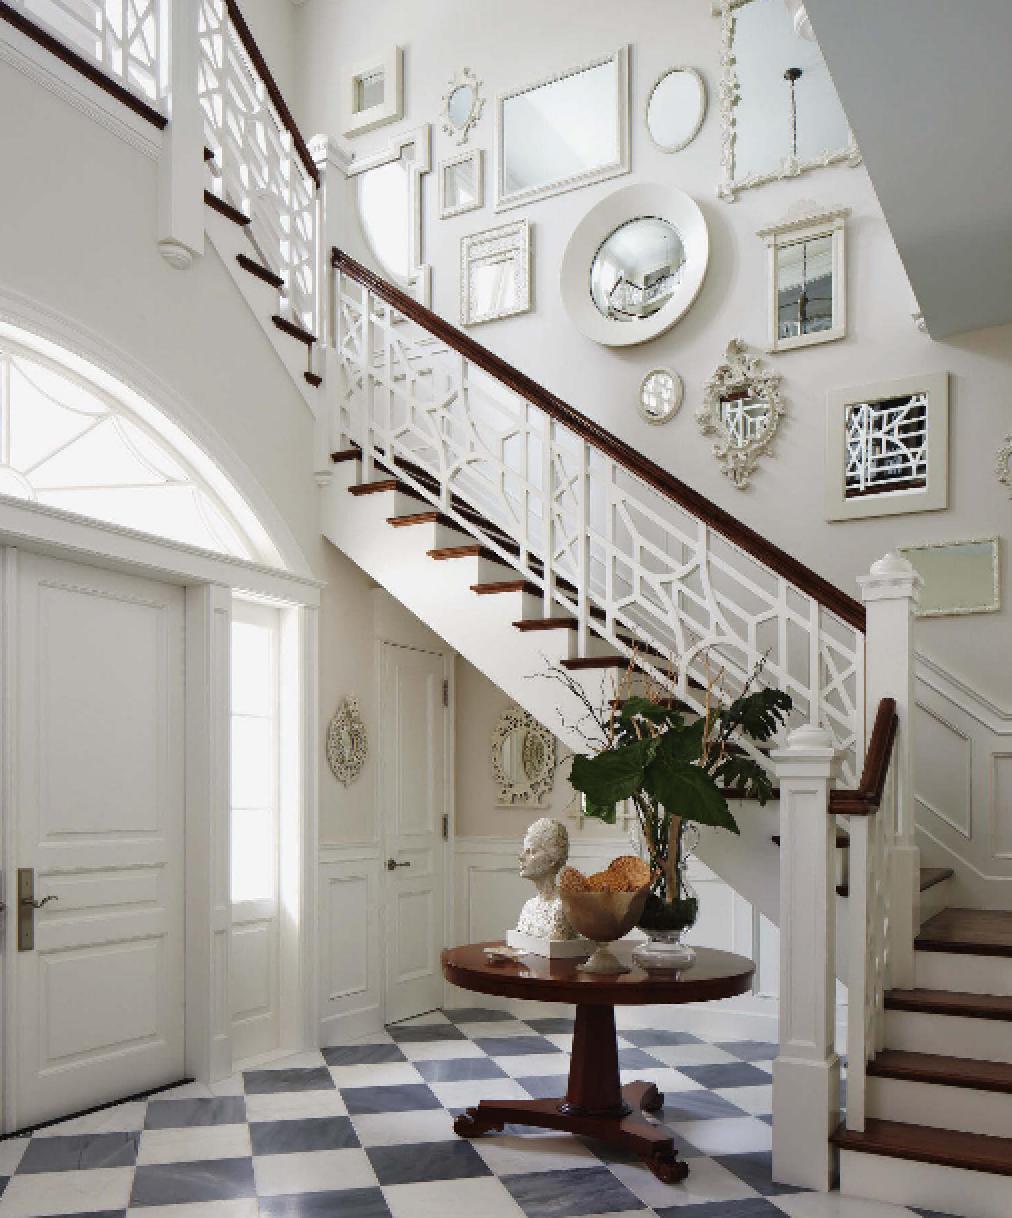 Bermuda house style